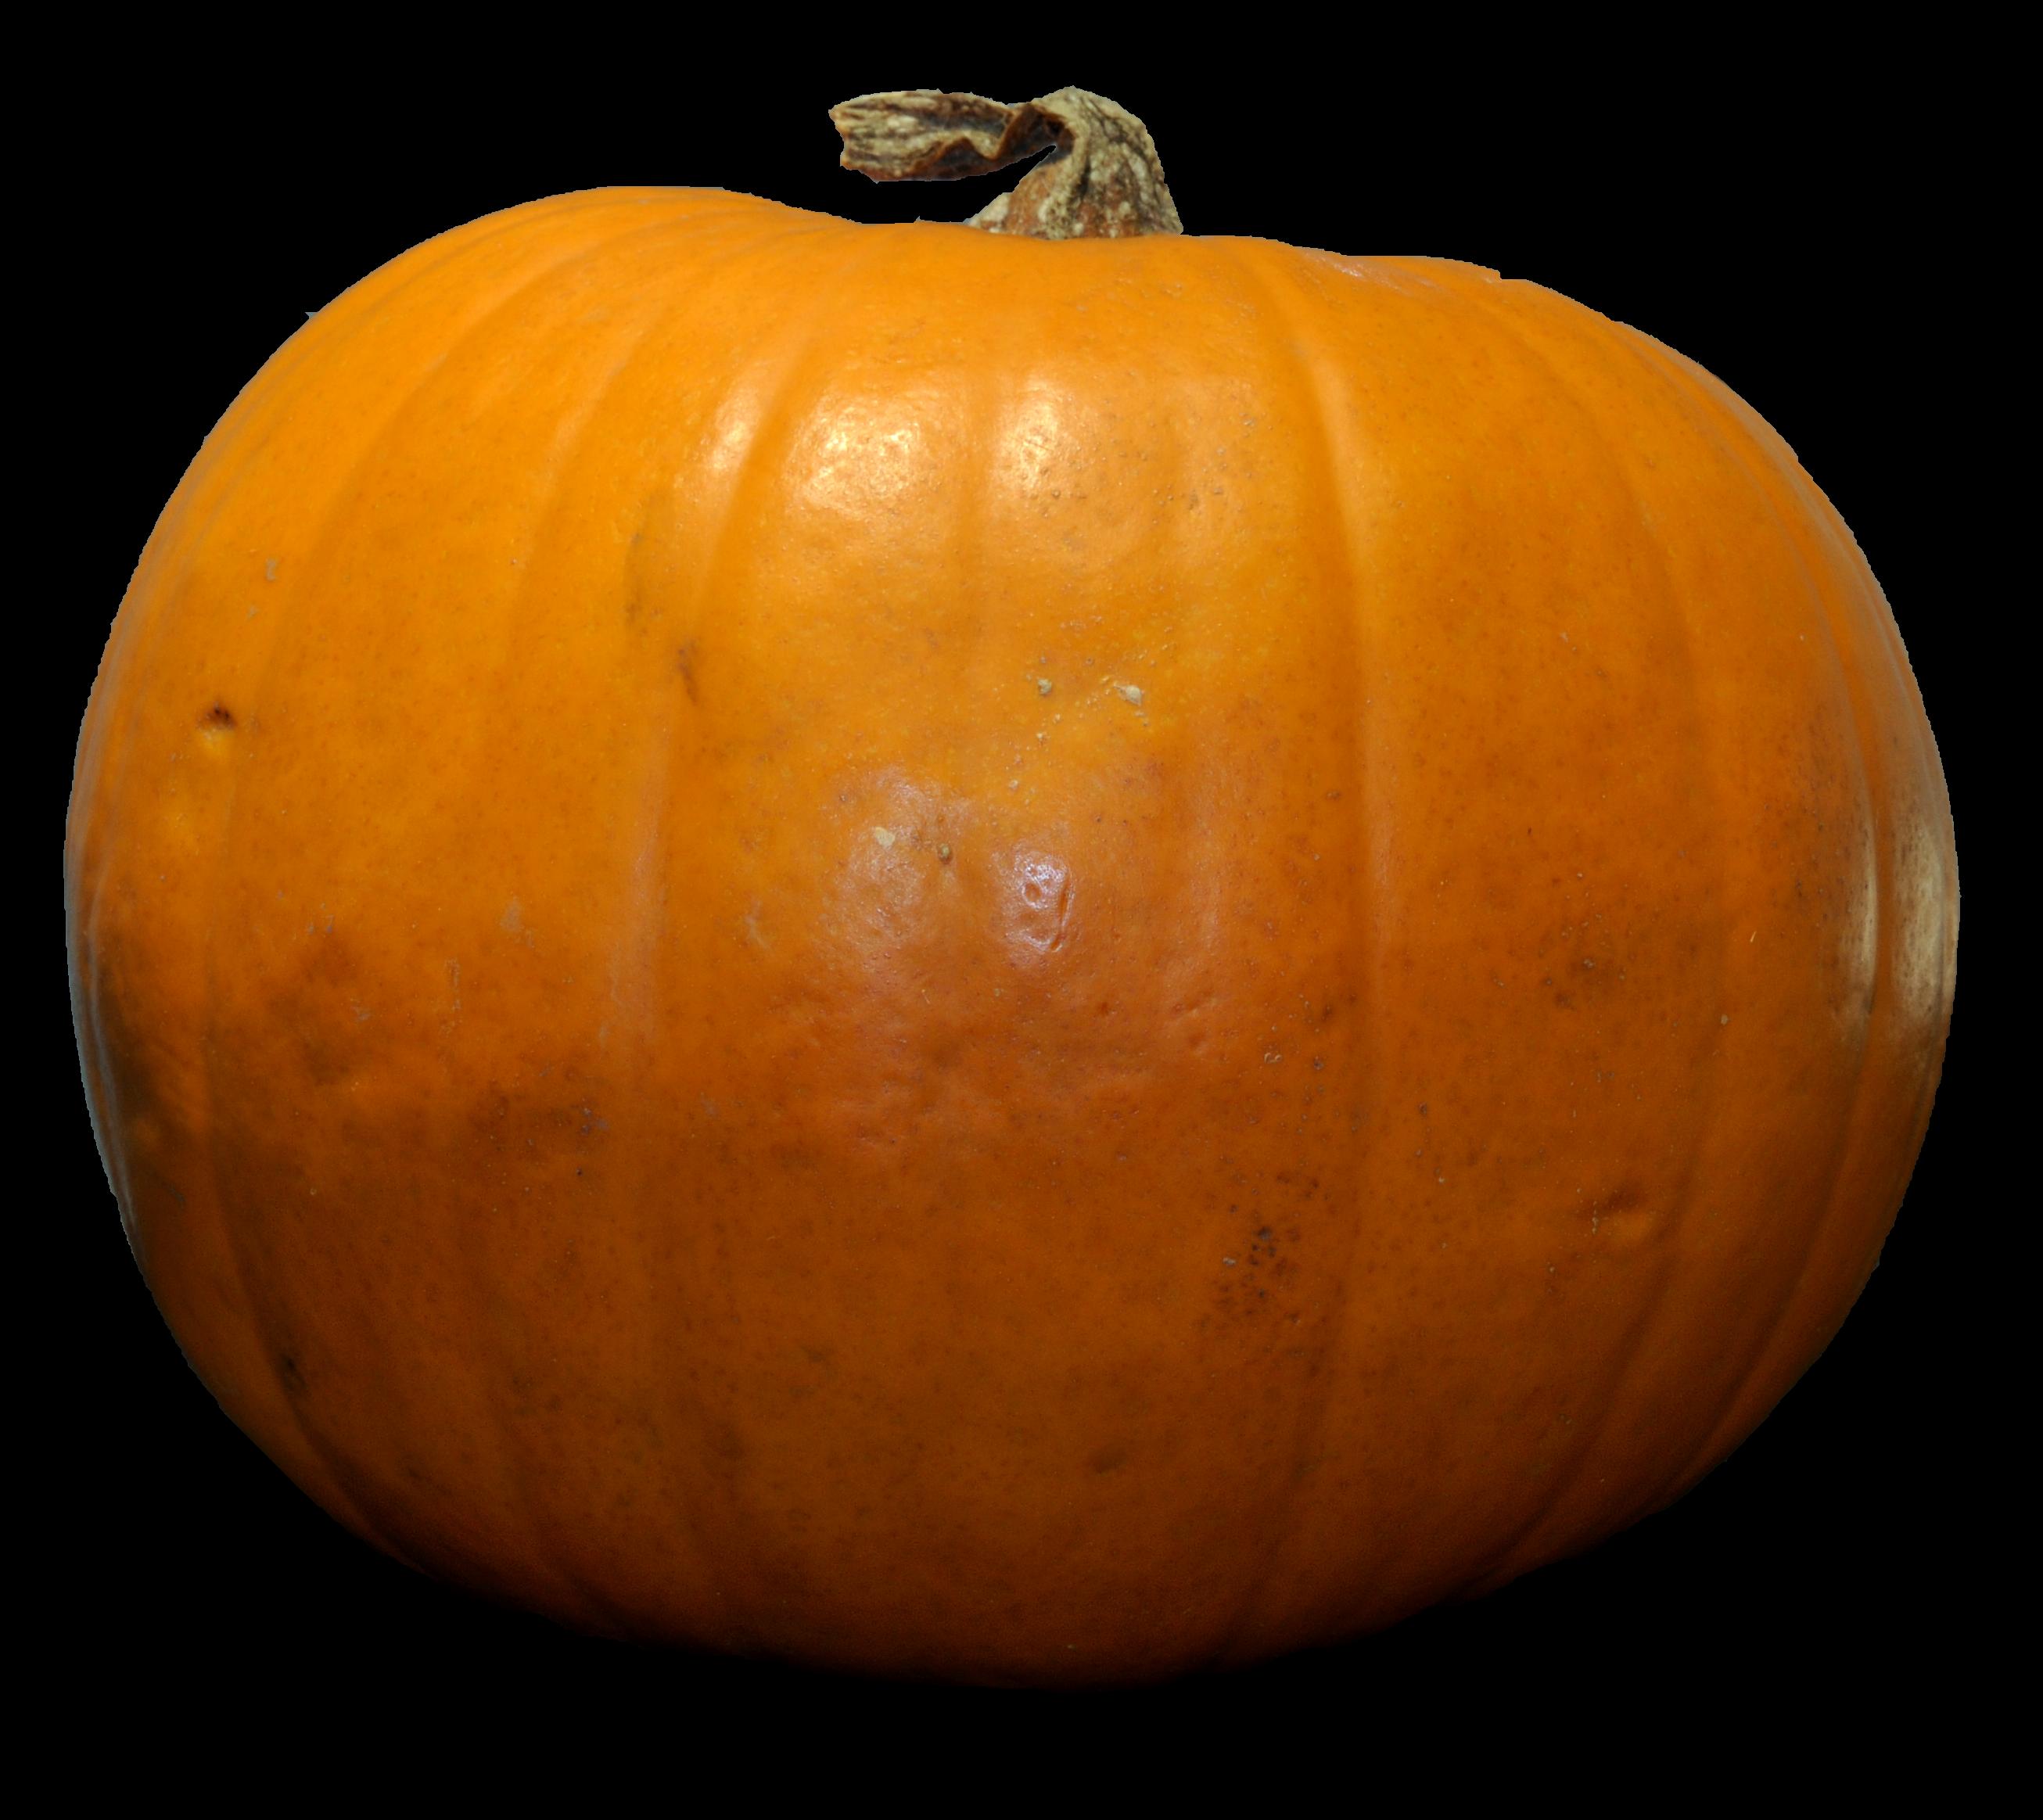 Cross clipart pumpkin. Png images free download